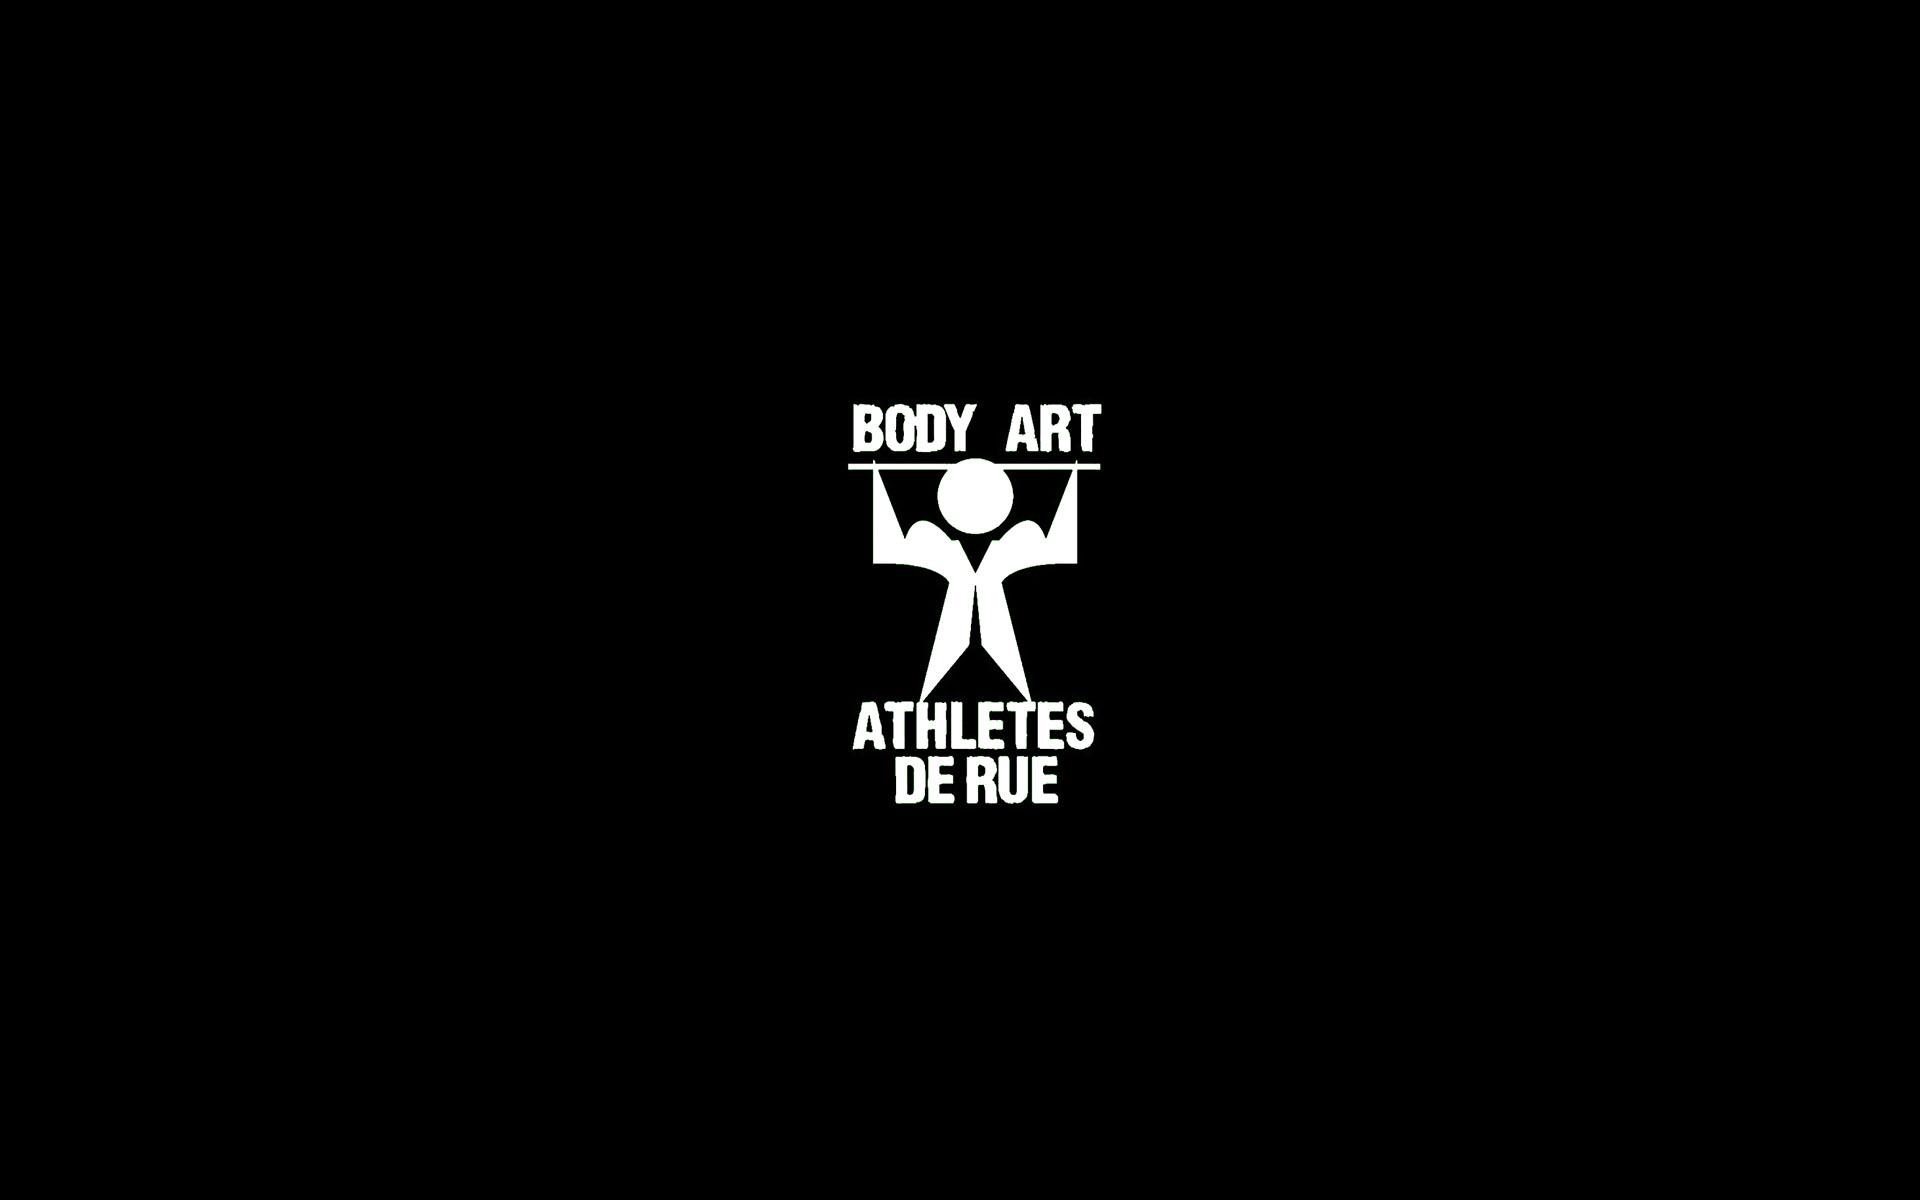 Body Art - athlètes de rue